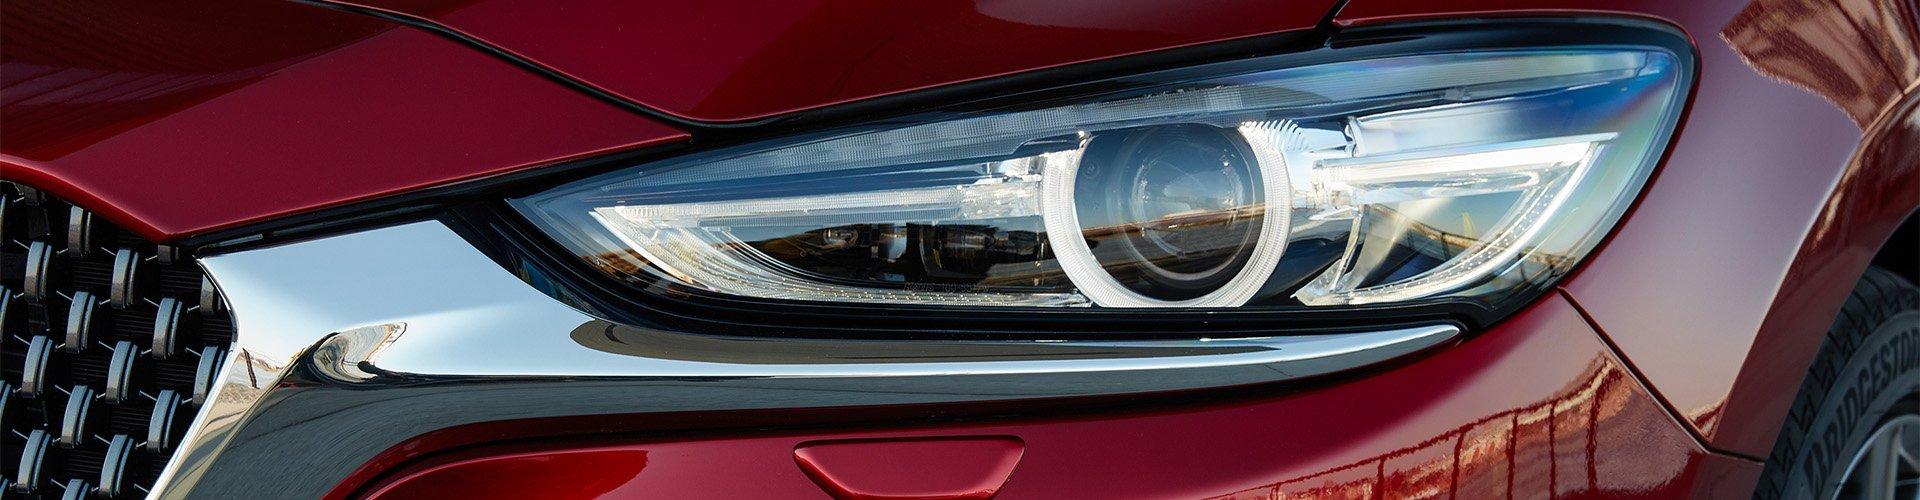 Mazda Care Wartungspaket